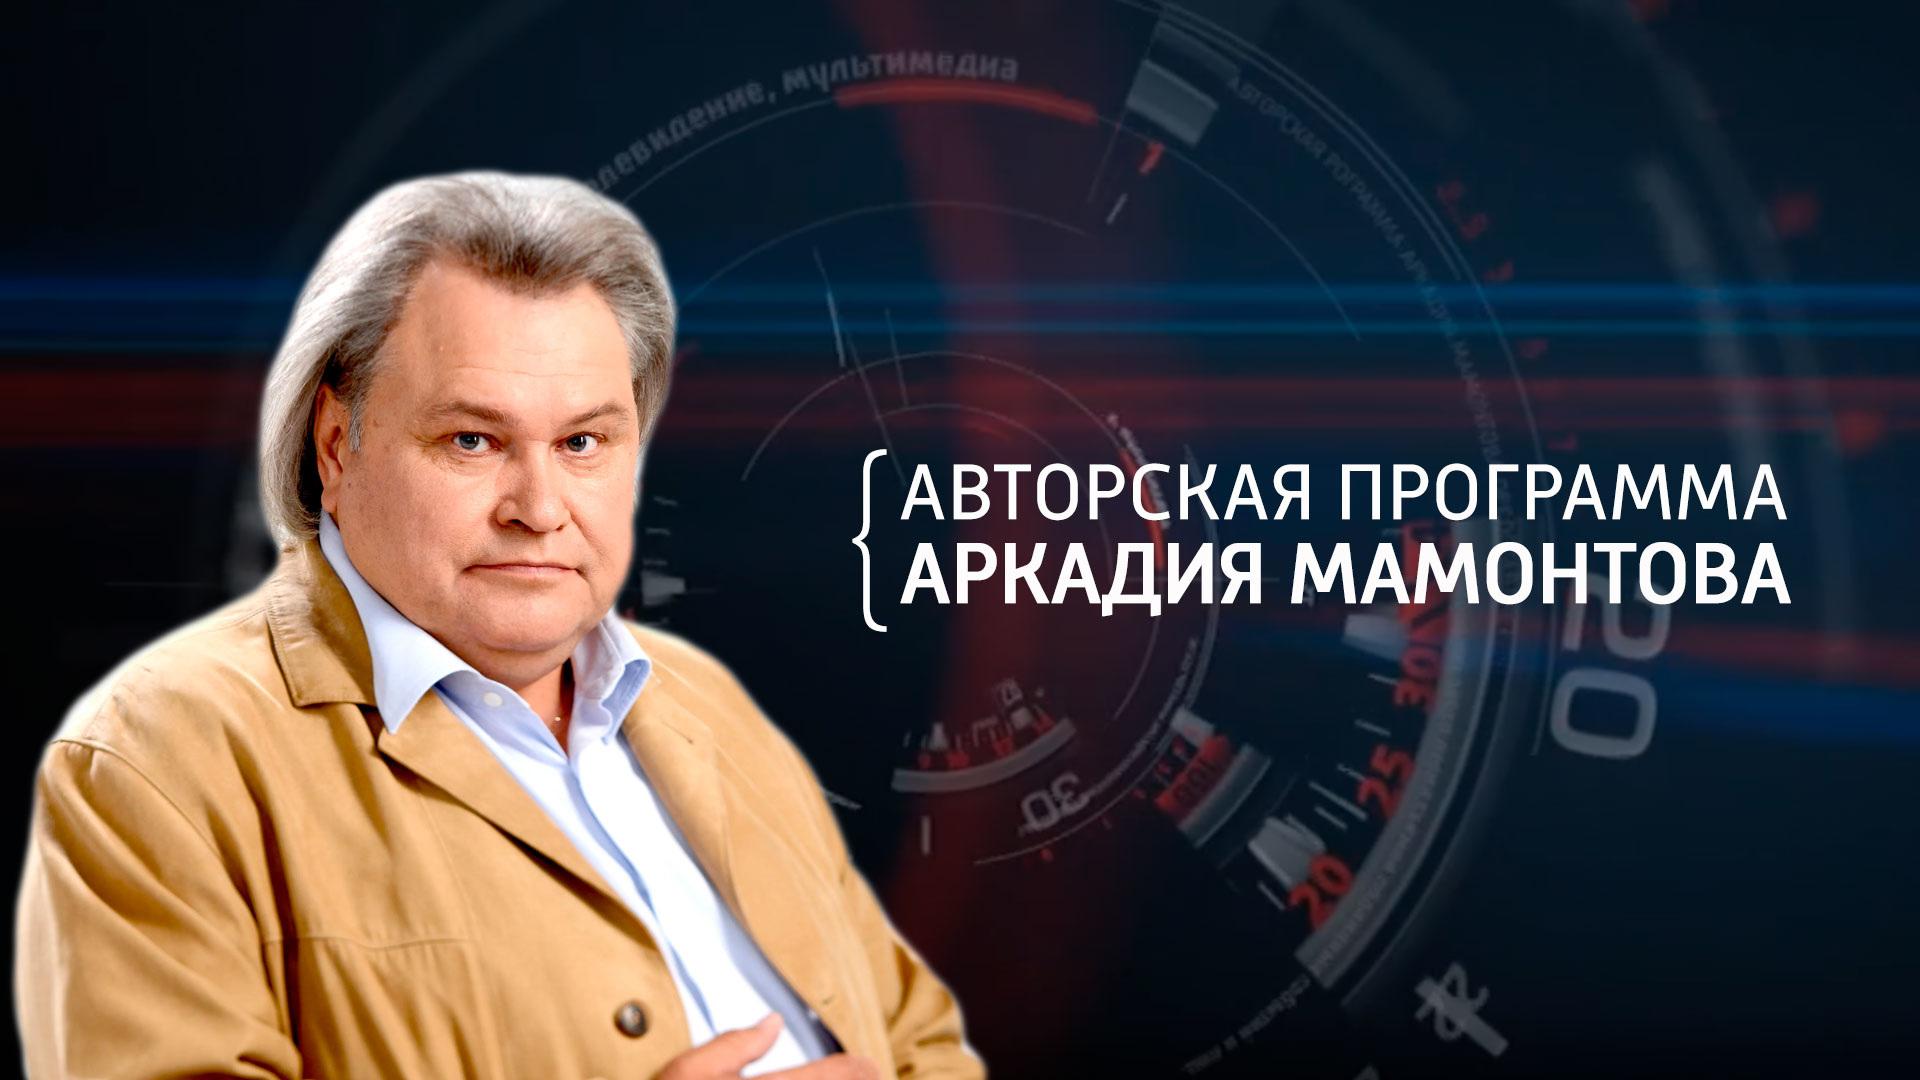 Авторская программа Аркадия Мамонтова